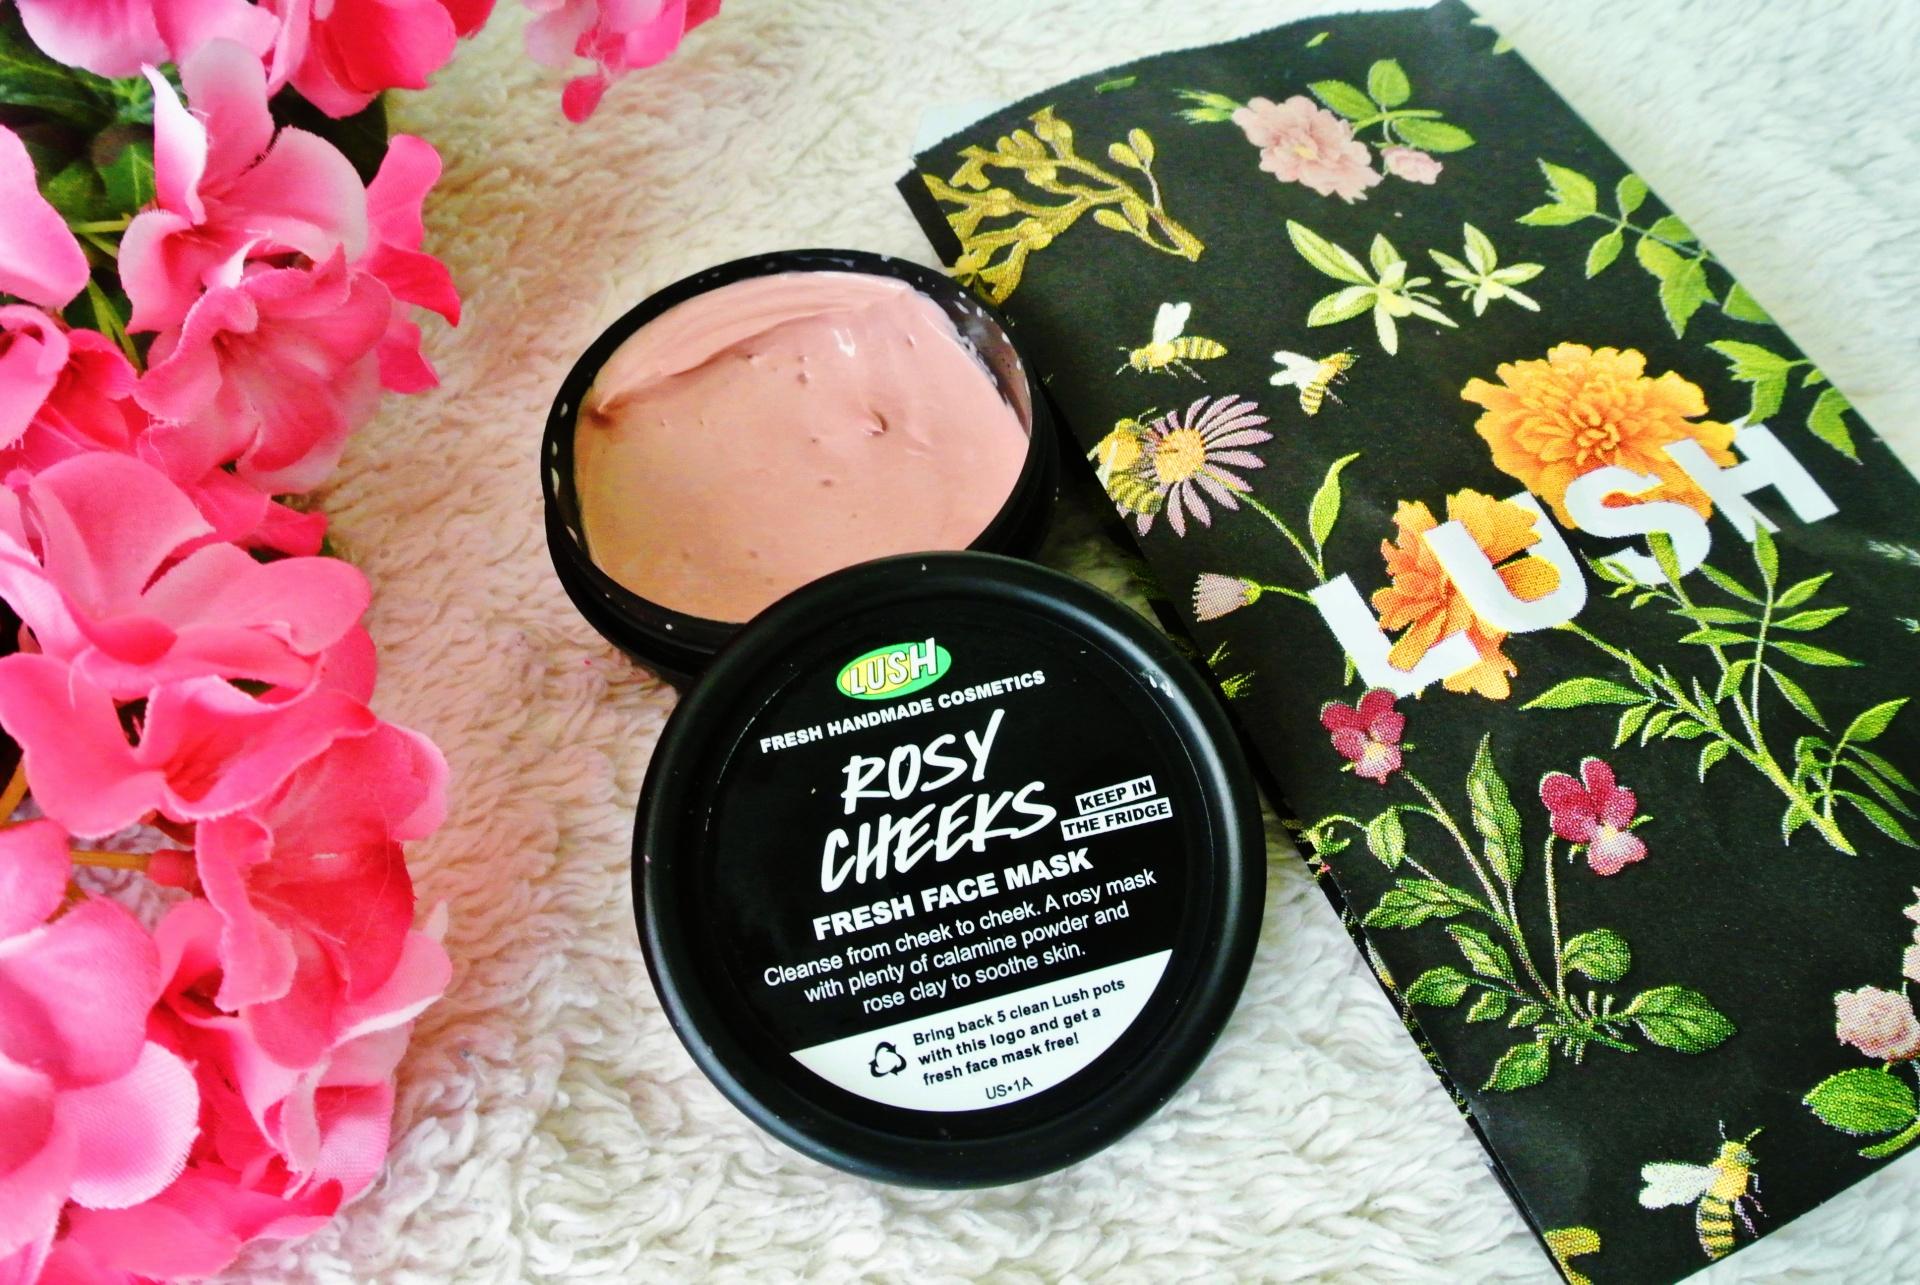 Lush Cosmetics Spring Mini-Haul // Rosy Cheeks fresh face mask